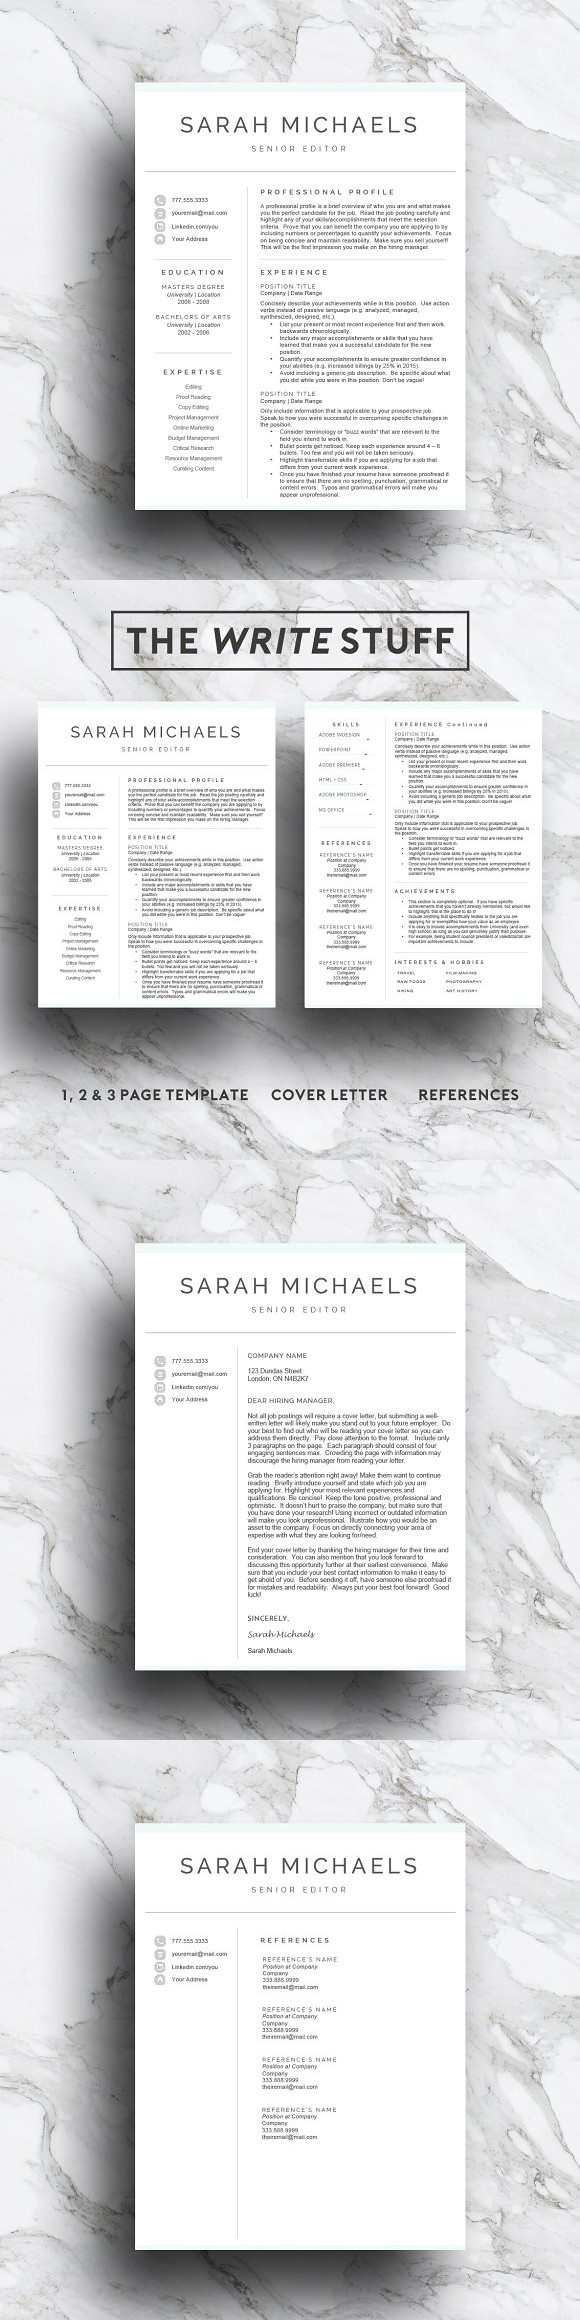 Resume Template| CV (1, 2 & 3 Page). Resume Templates